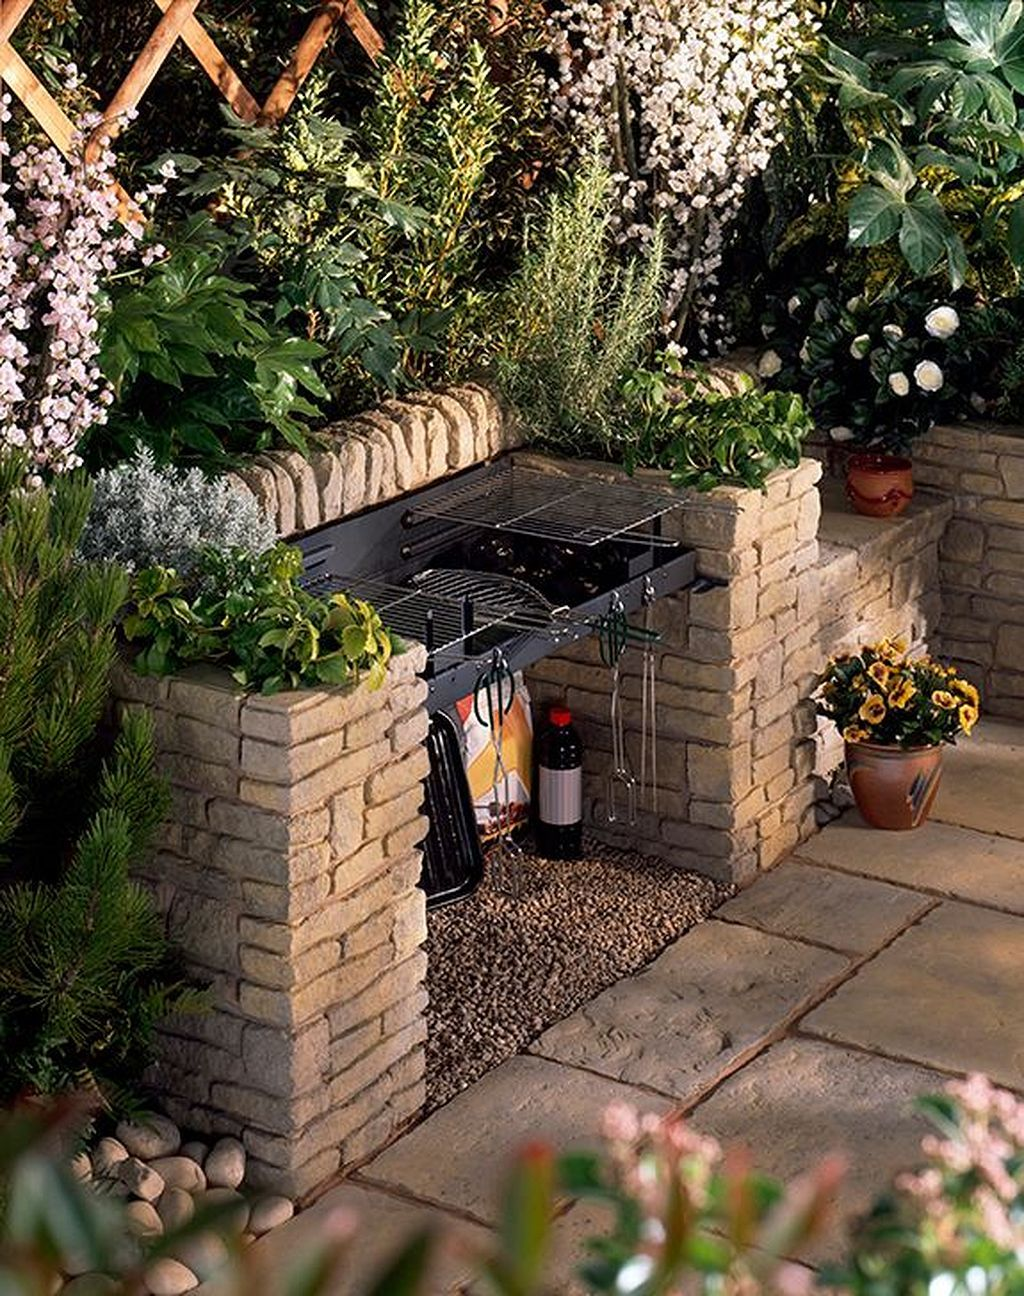 25 Best DIY Backyard Brick Barbecue Ideas - HomeGardenMagz ... on Diy Bbq Patio id=35613